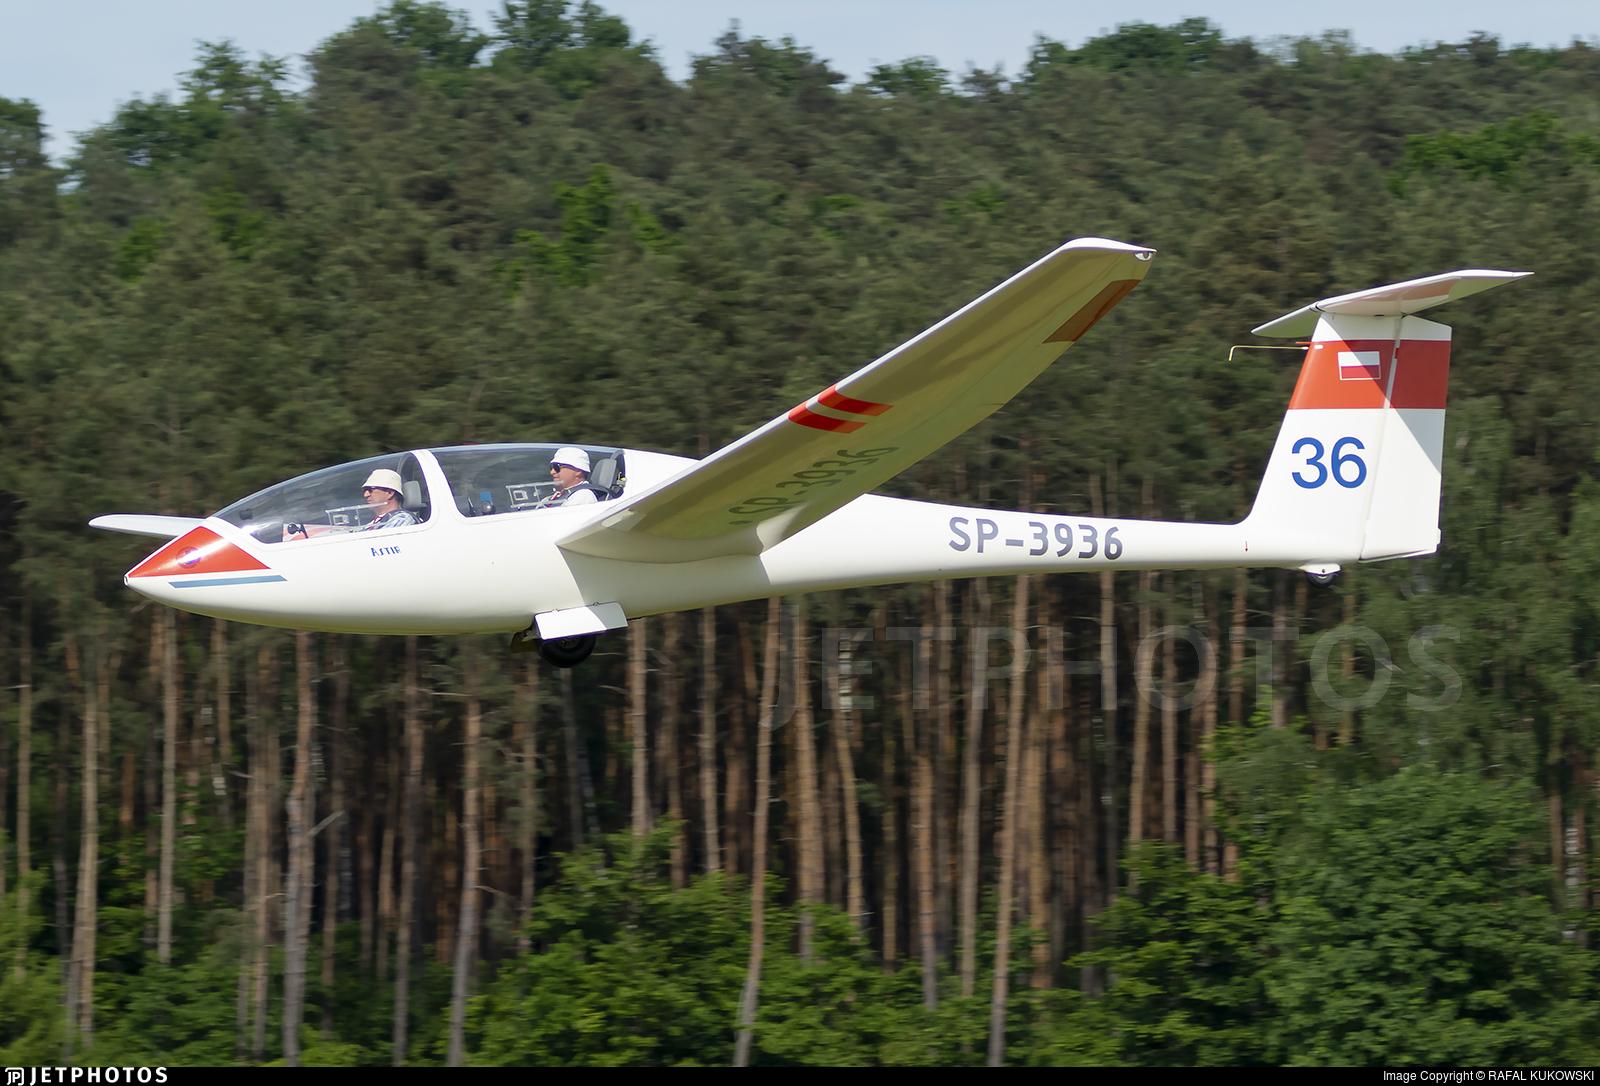 SP-3936 - Grob G-103 Twin Astir - Private